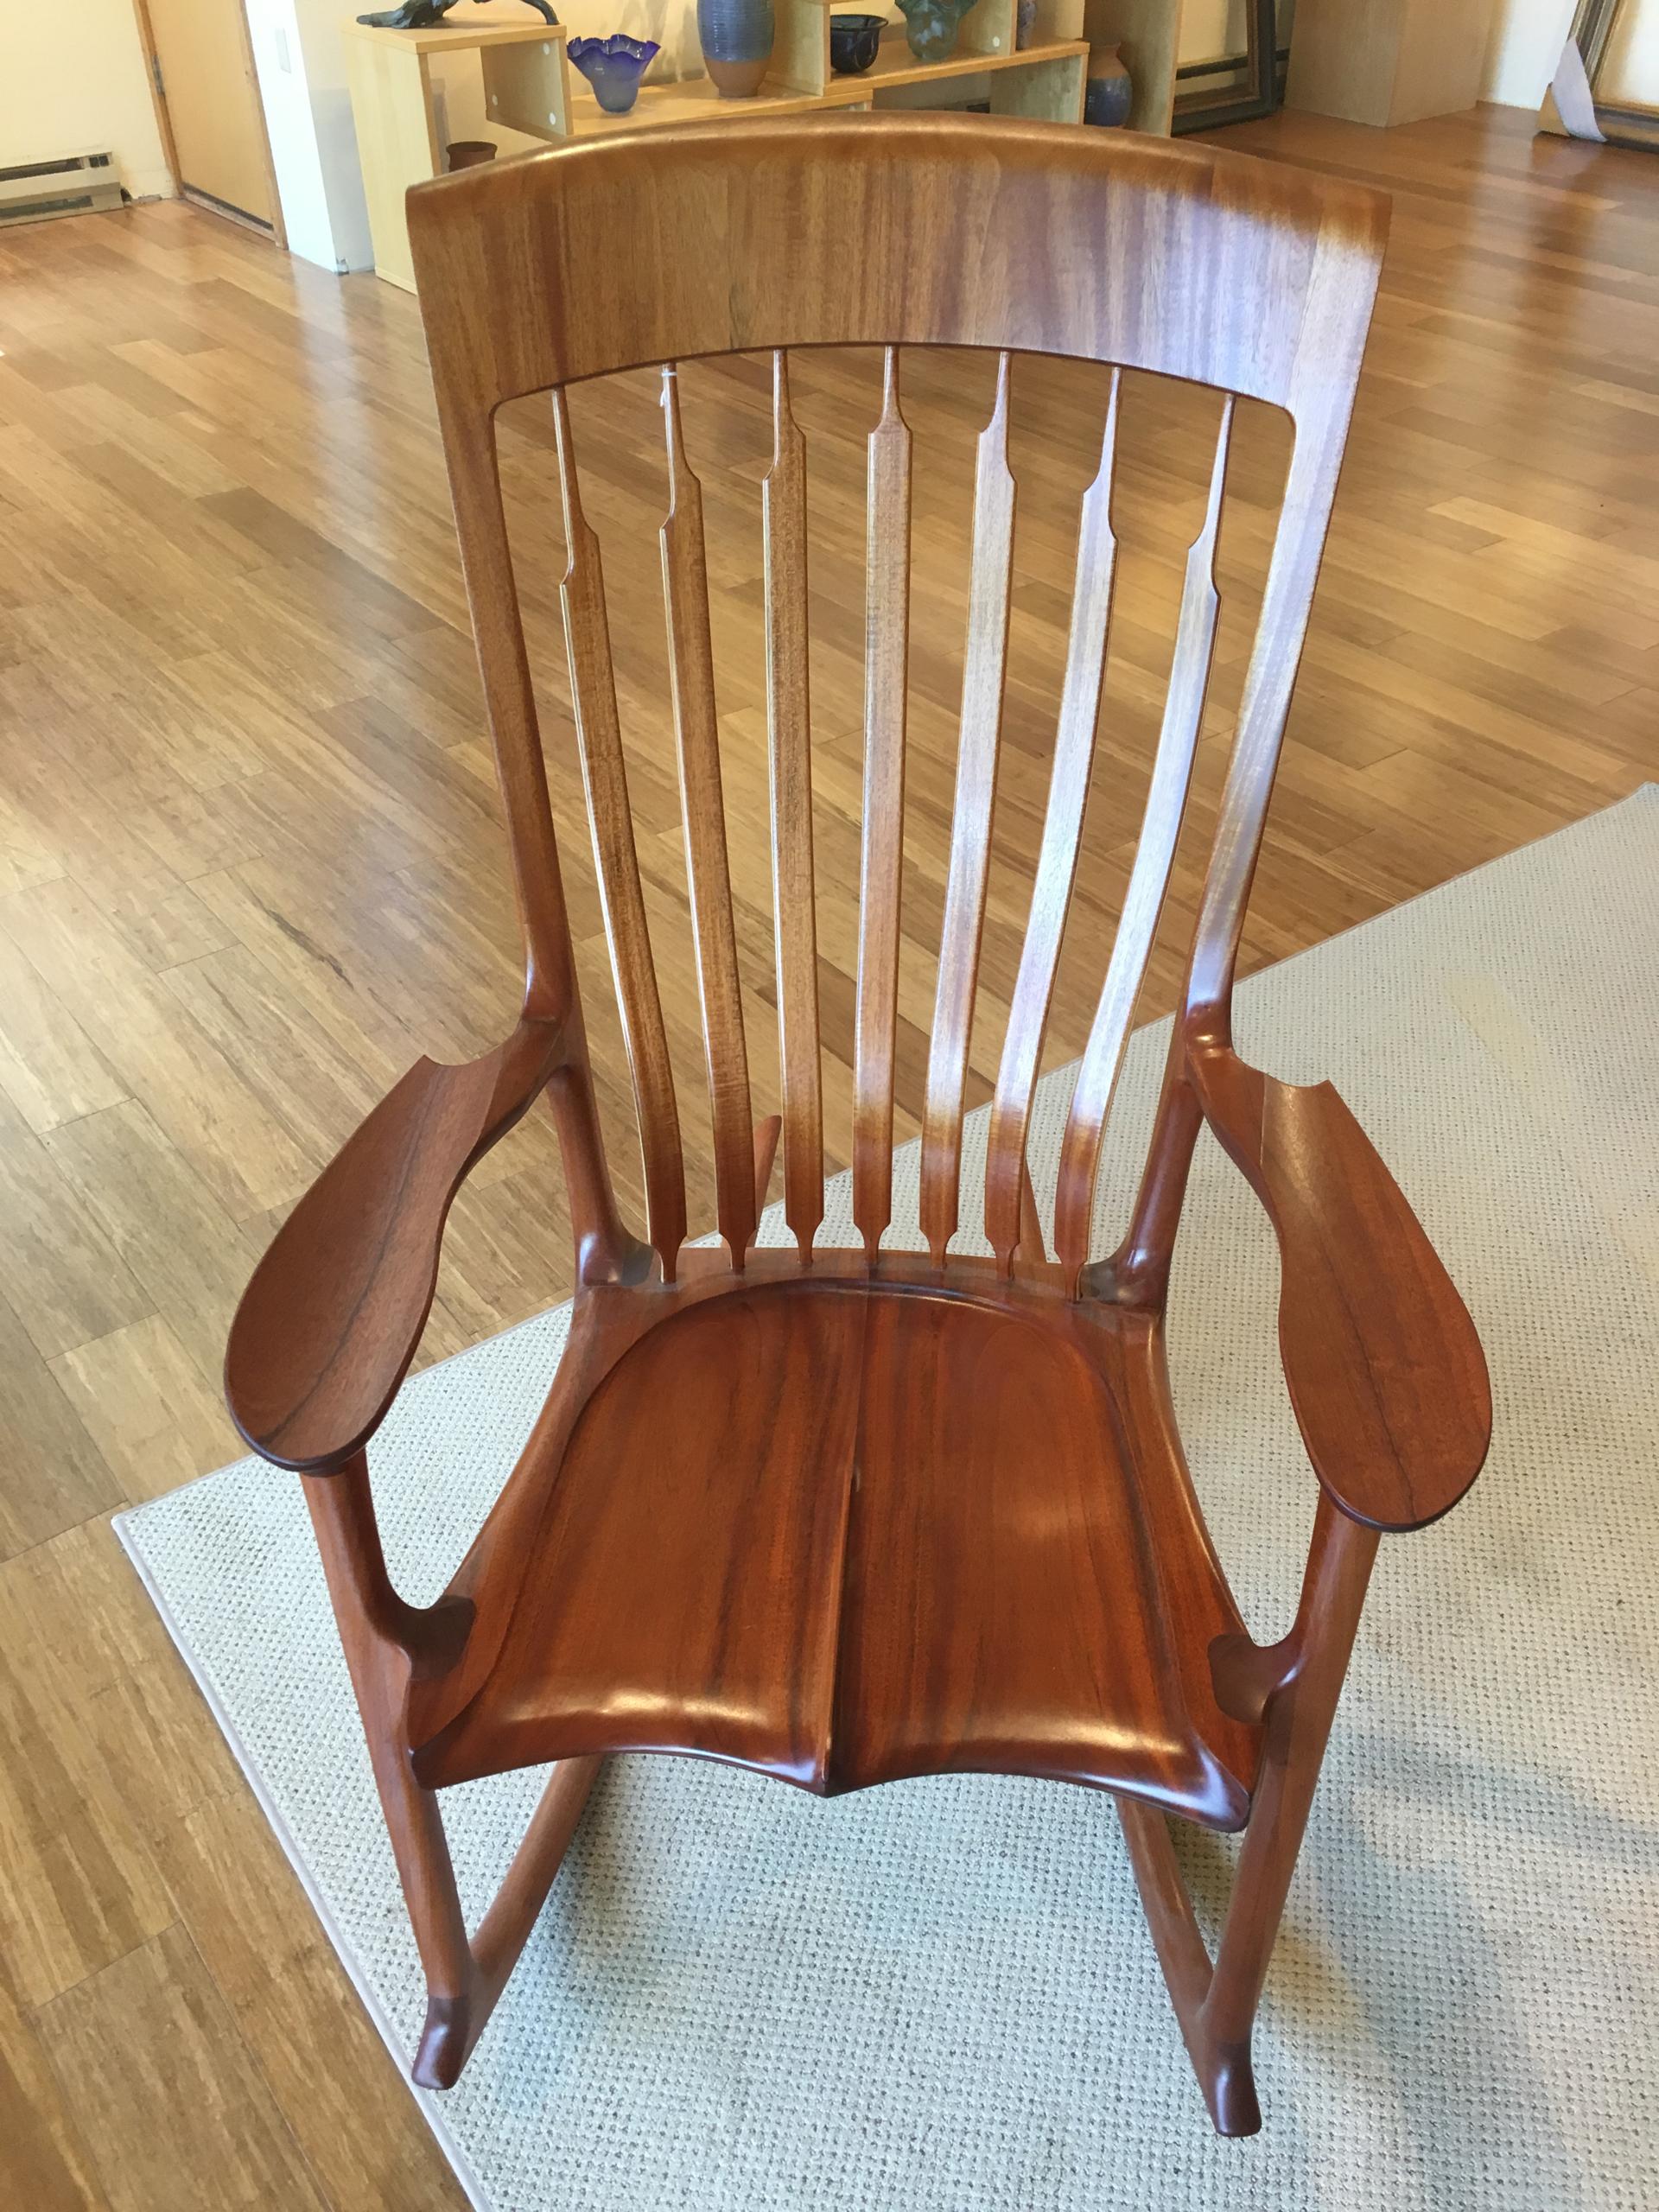 Myrtle Wood Rocker Rocking Chair by Jim Norris